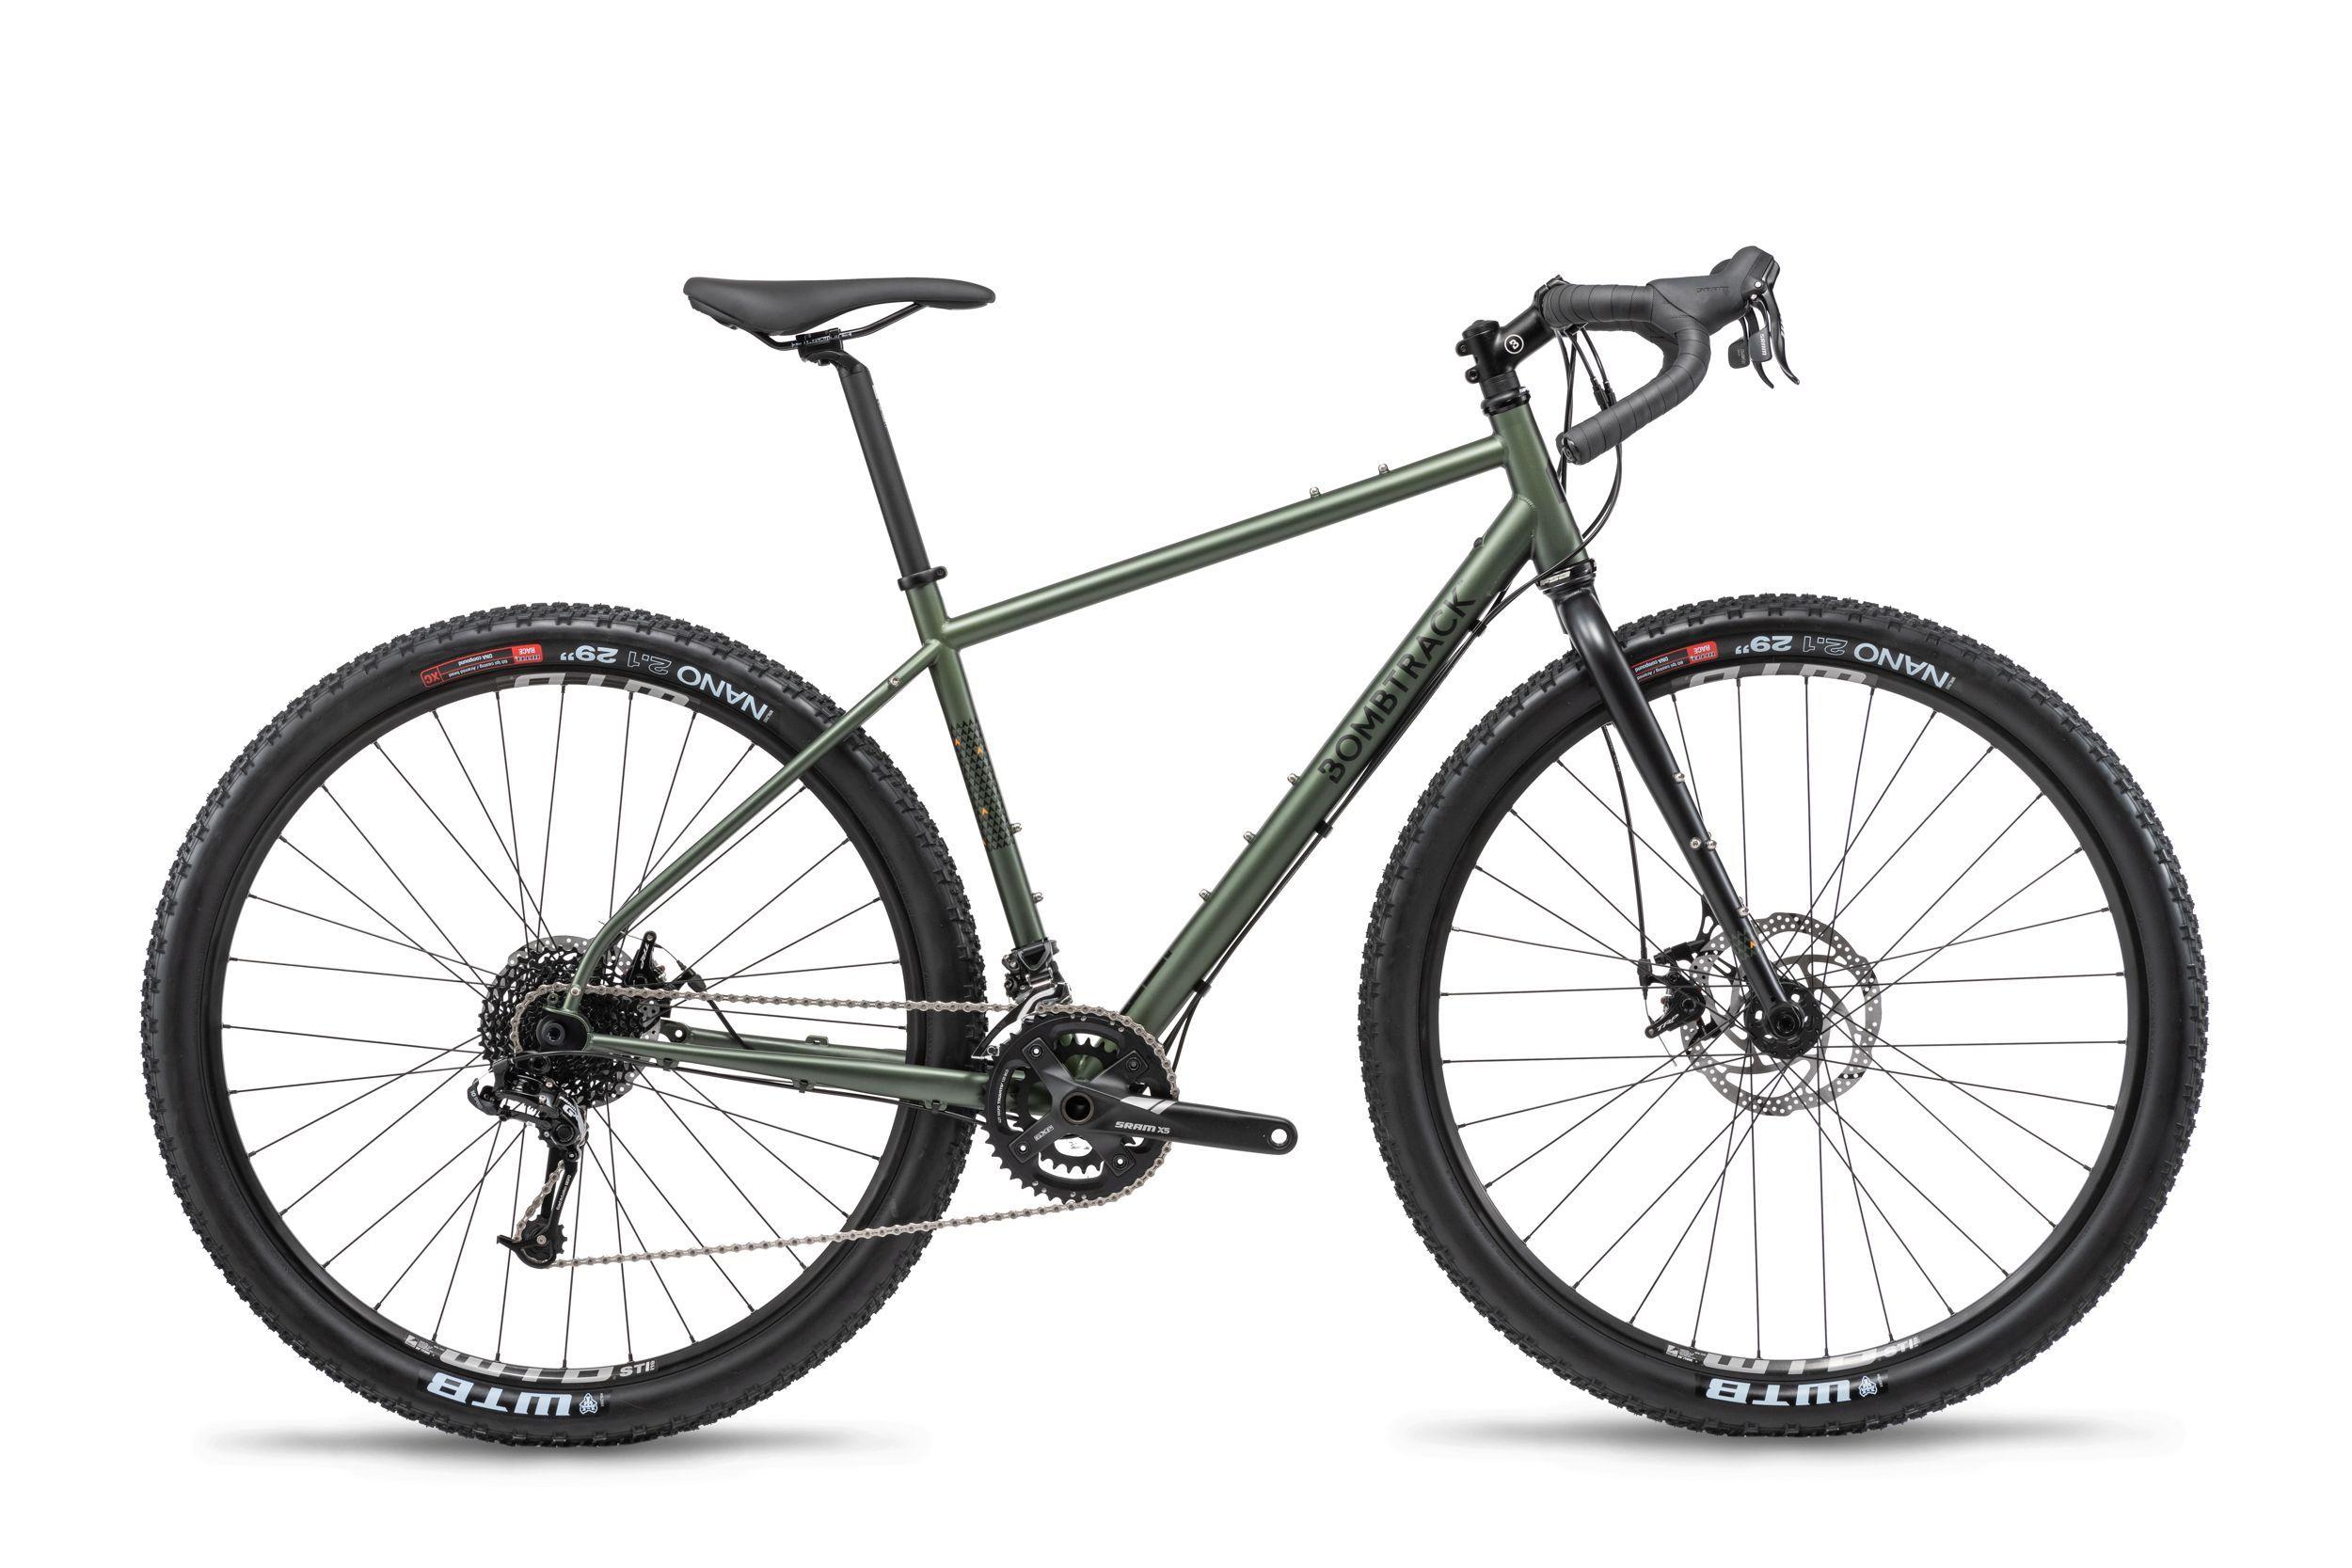 Bombtrack Beyond 44cm Green All Road Bike 2019 (shop Soiled) | Road bikes